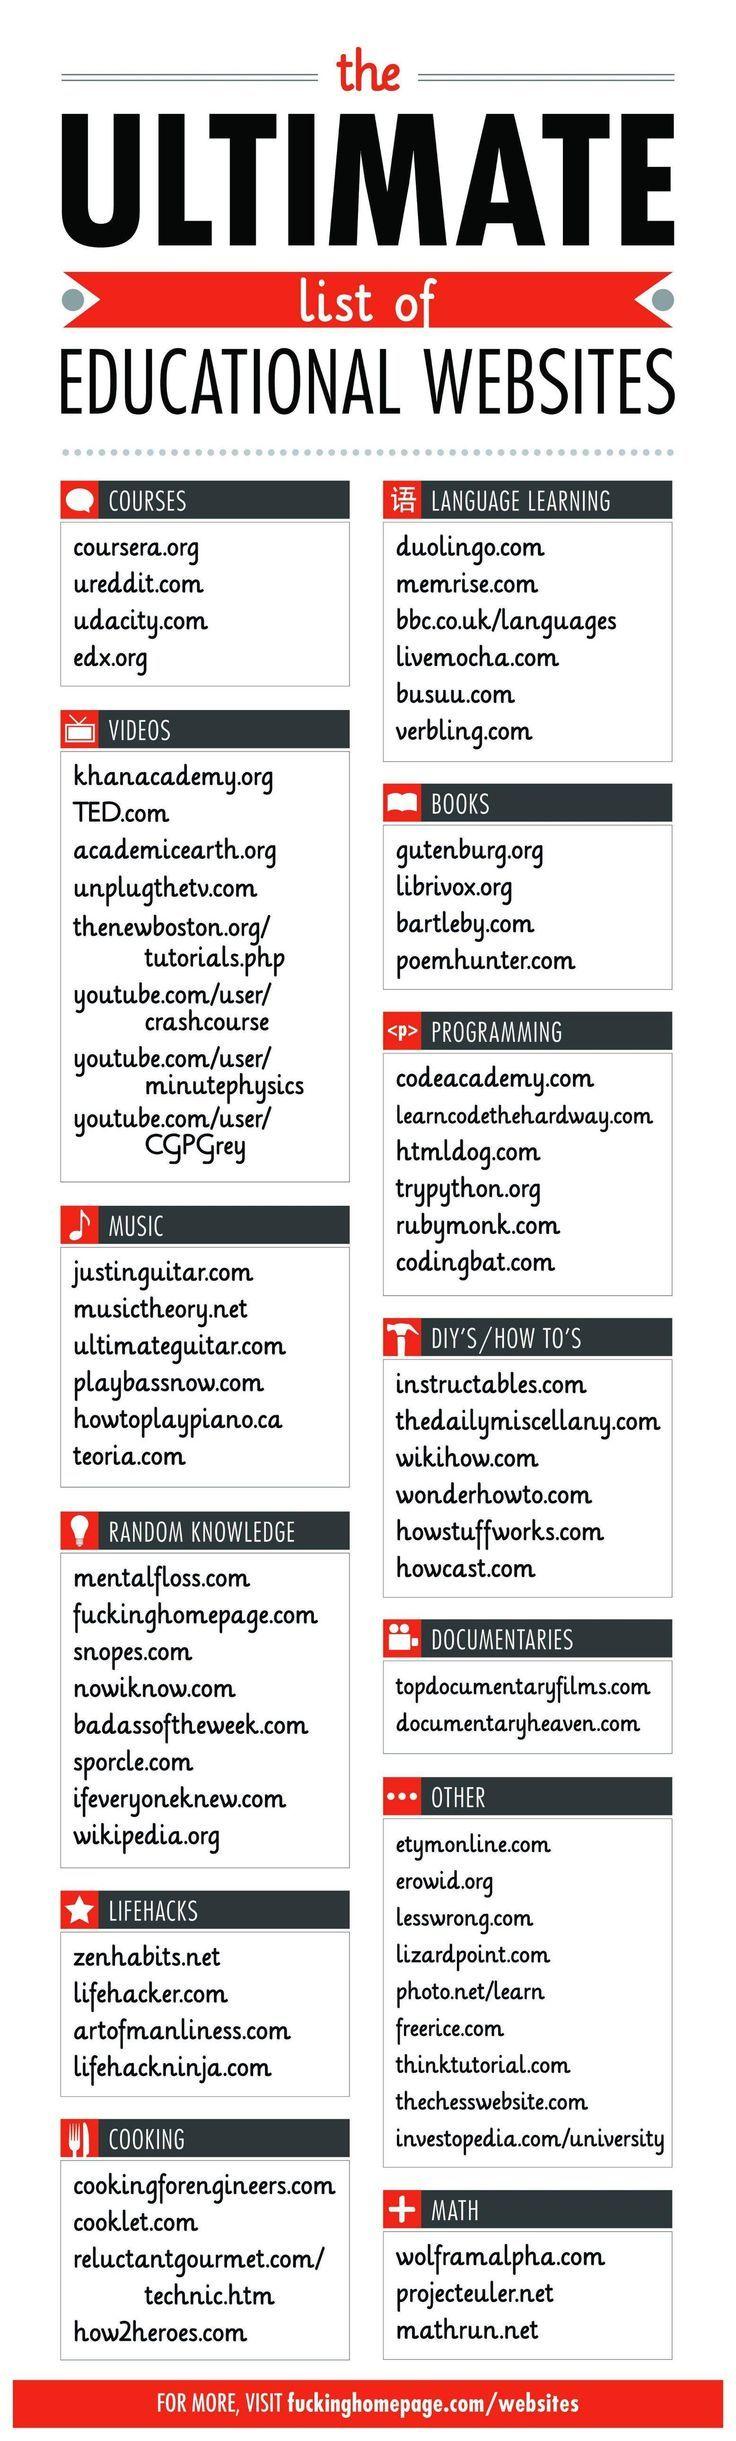 The Ultimate List of Educational Websites | Things for Geeks